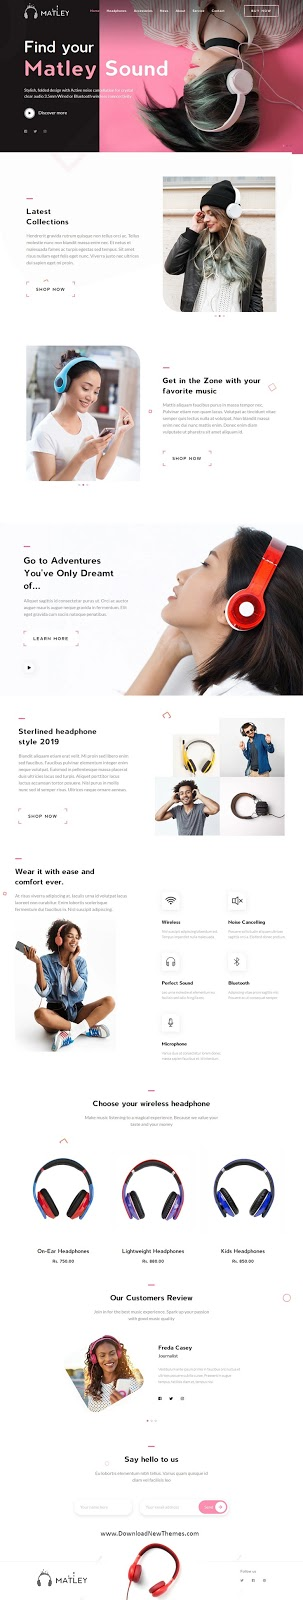 Best Headphone & Electronics Store Theme